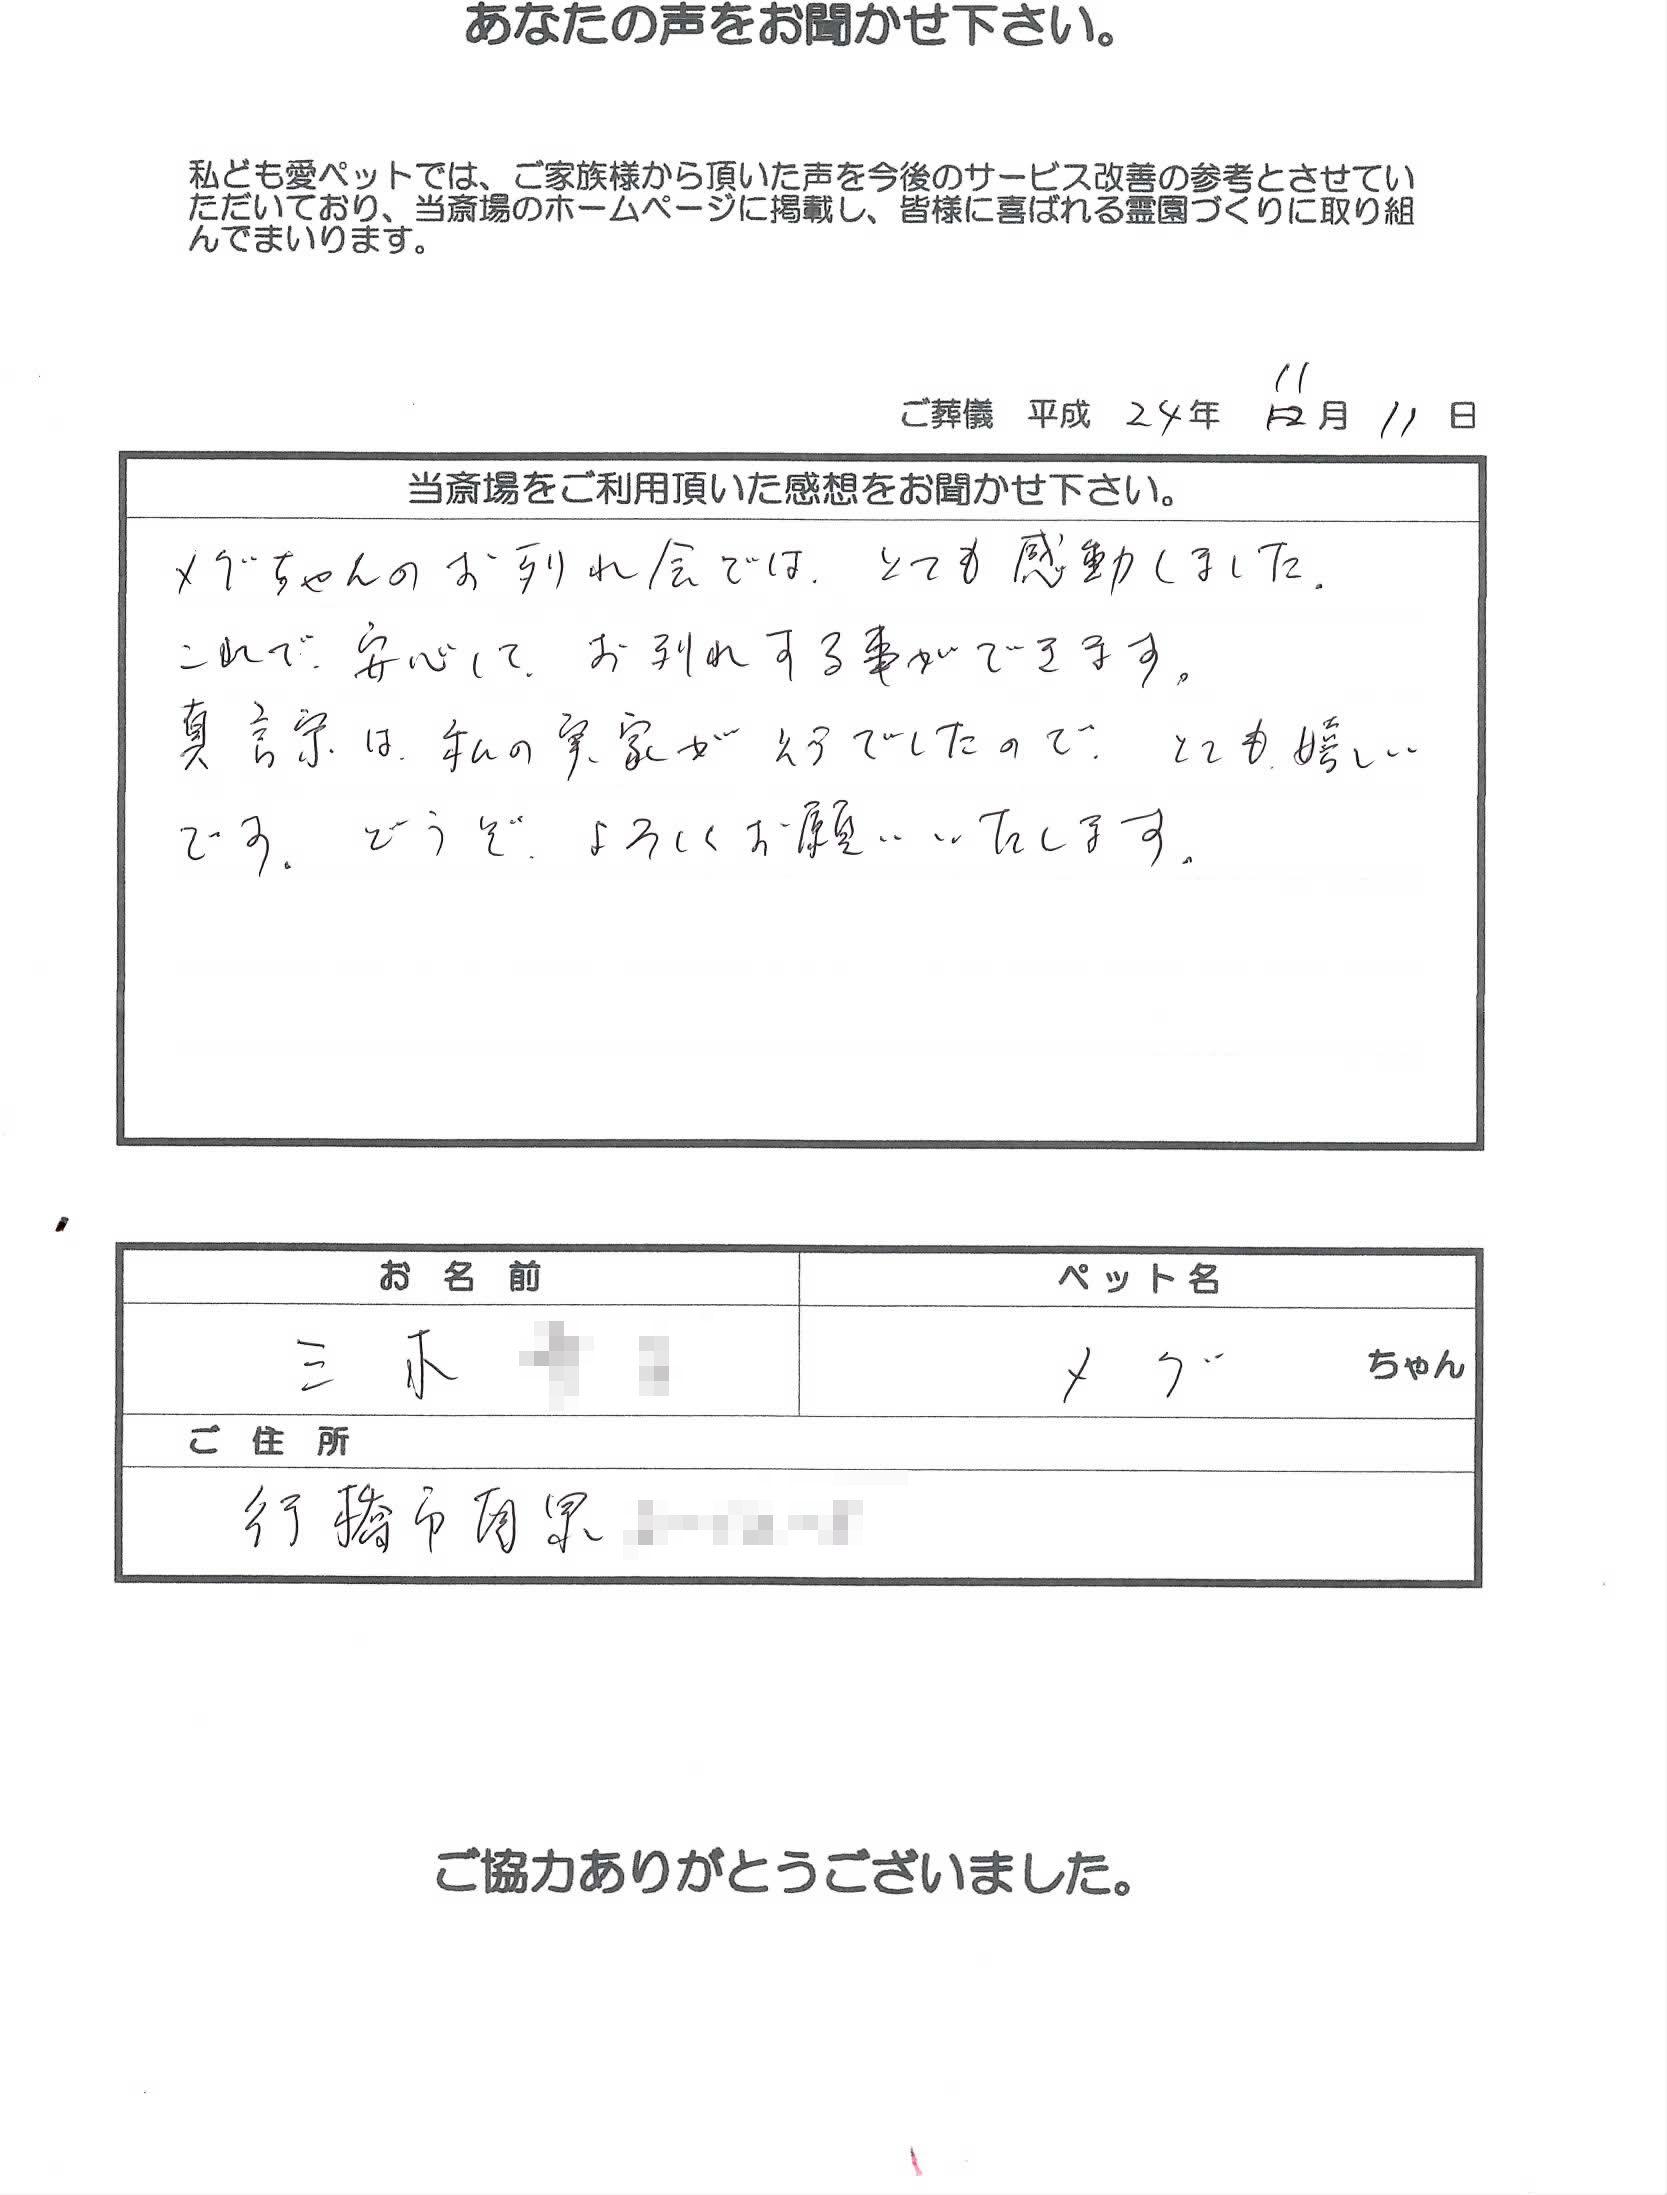 k121111-3.jpg